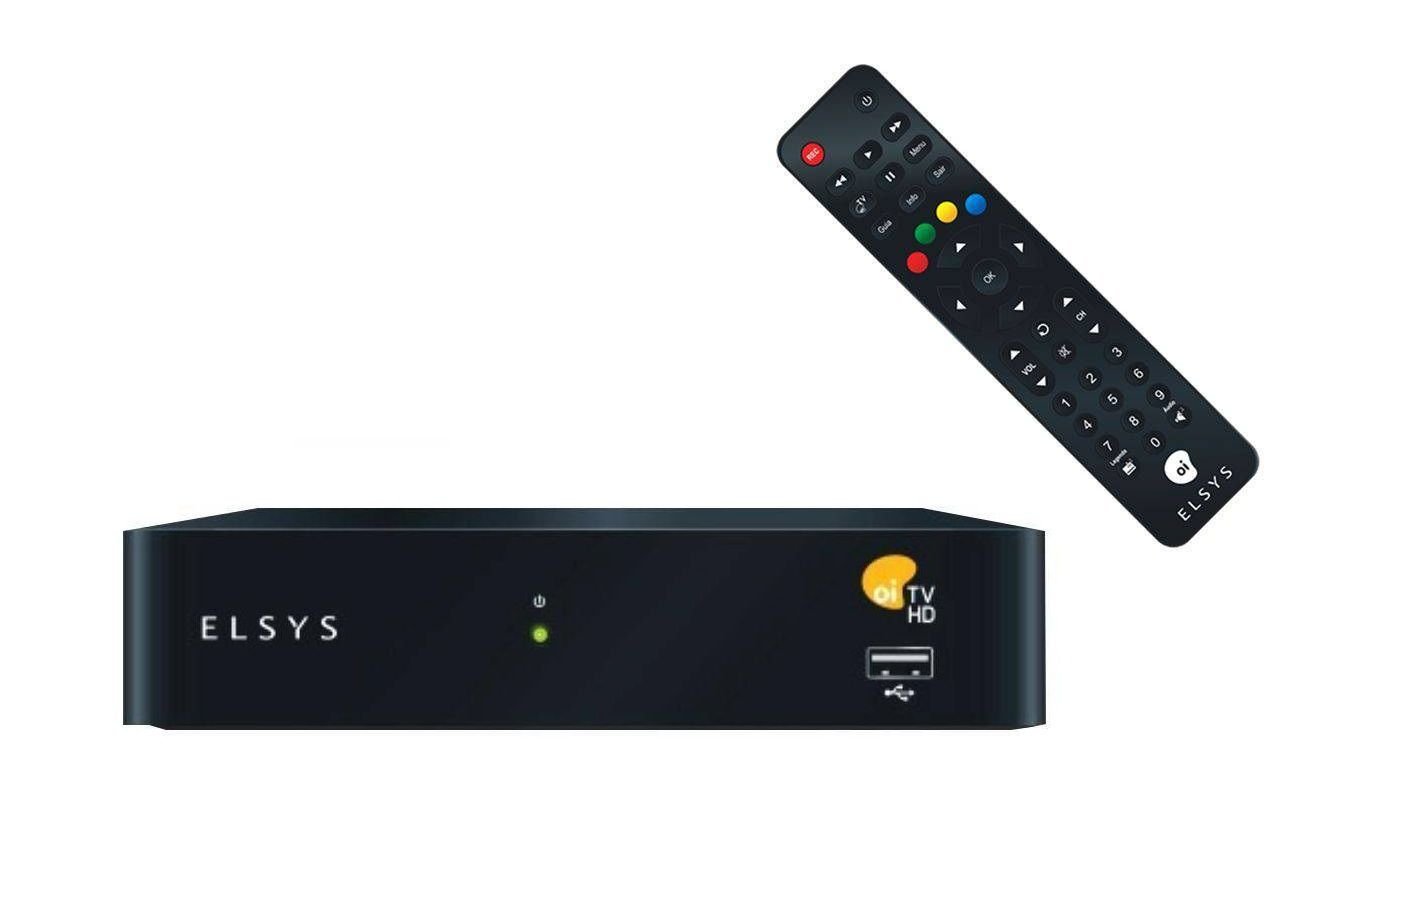 Receptor Digital Elsys Oi TV Hd Etrs37